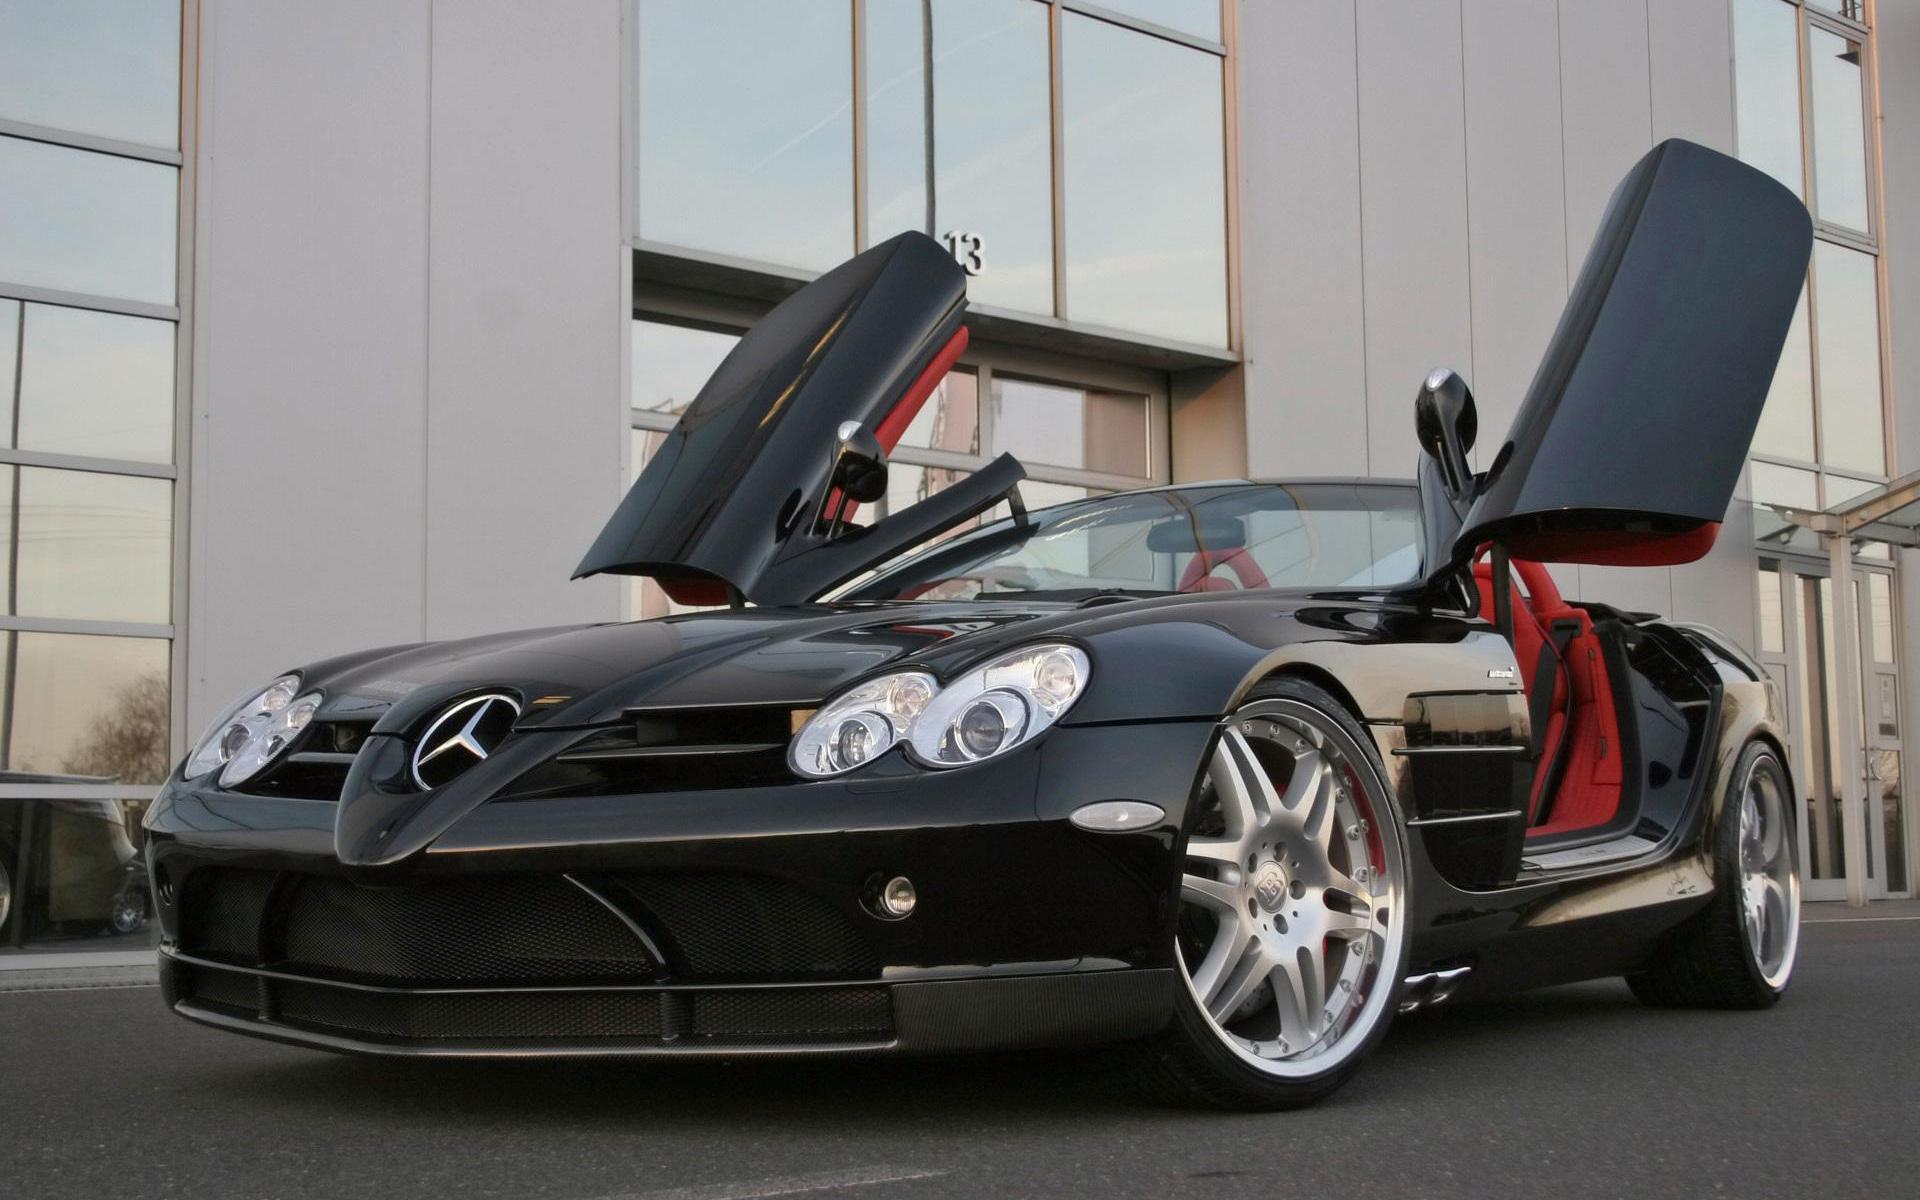 Image: http://www.desktopwallpaperhd.net/wallpapers/4/2/mercedes-benz-slr-mclaren-roadster-categories-cars-brabus-47218.jpg